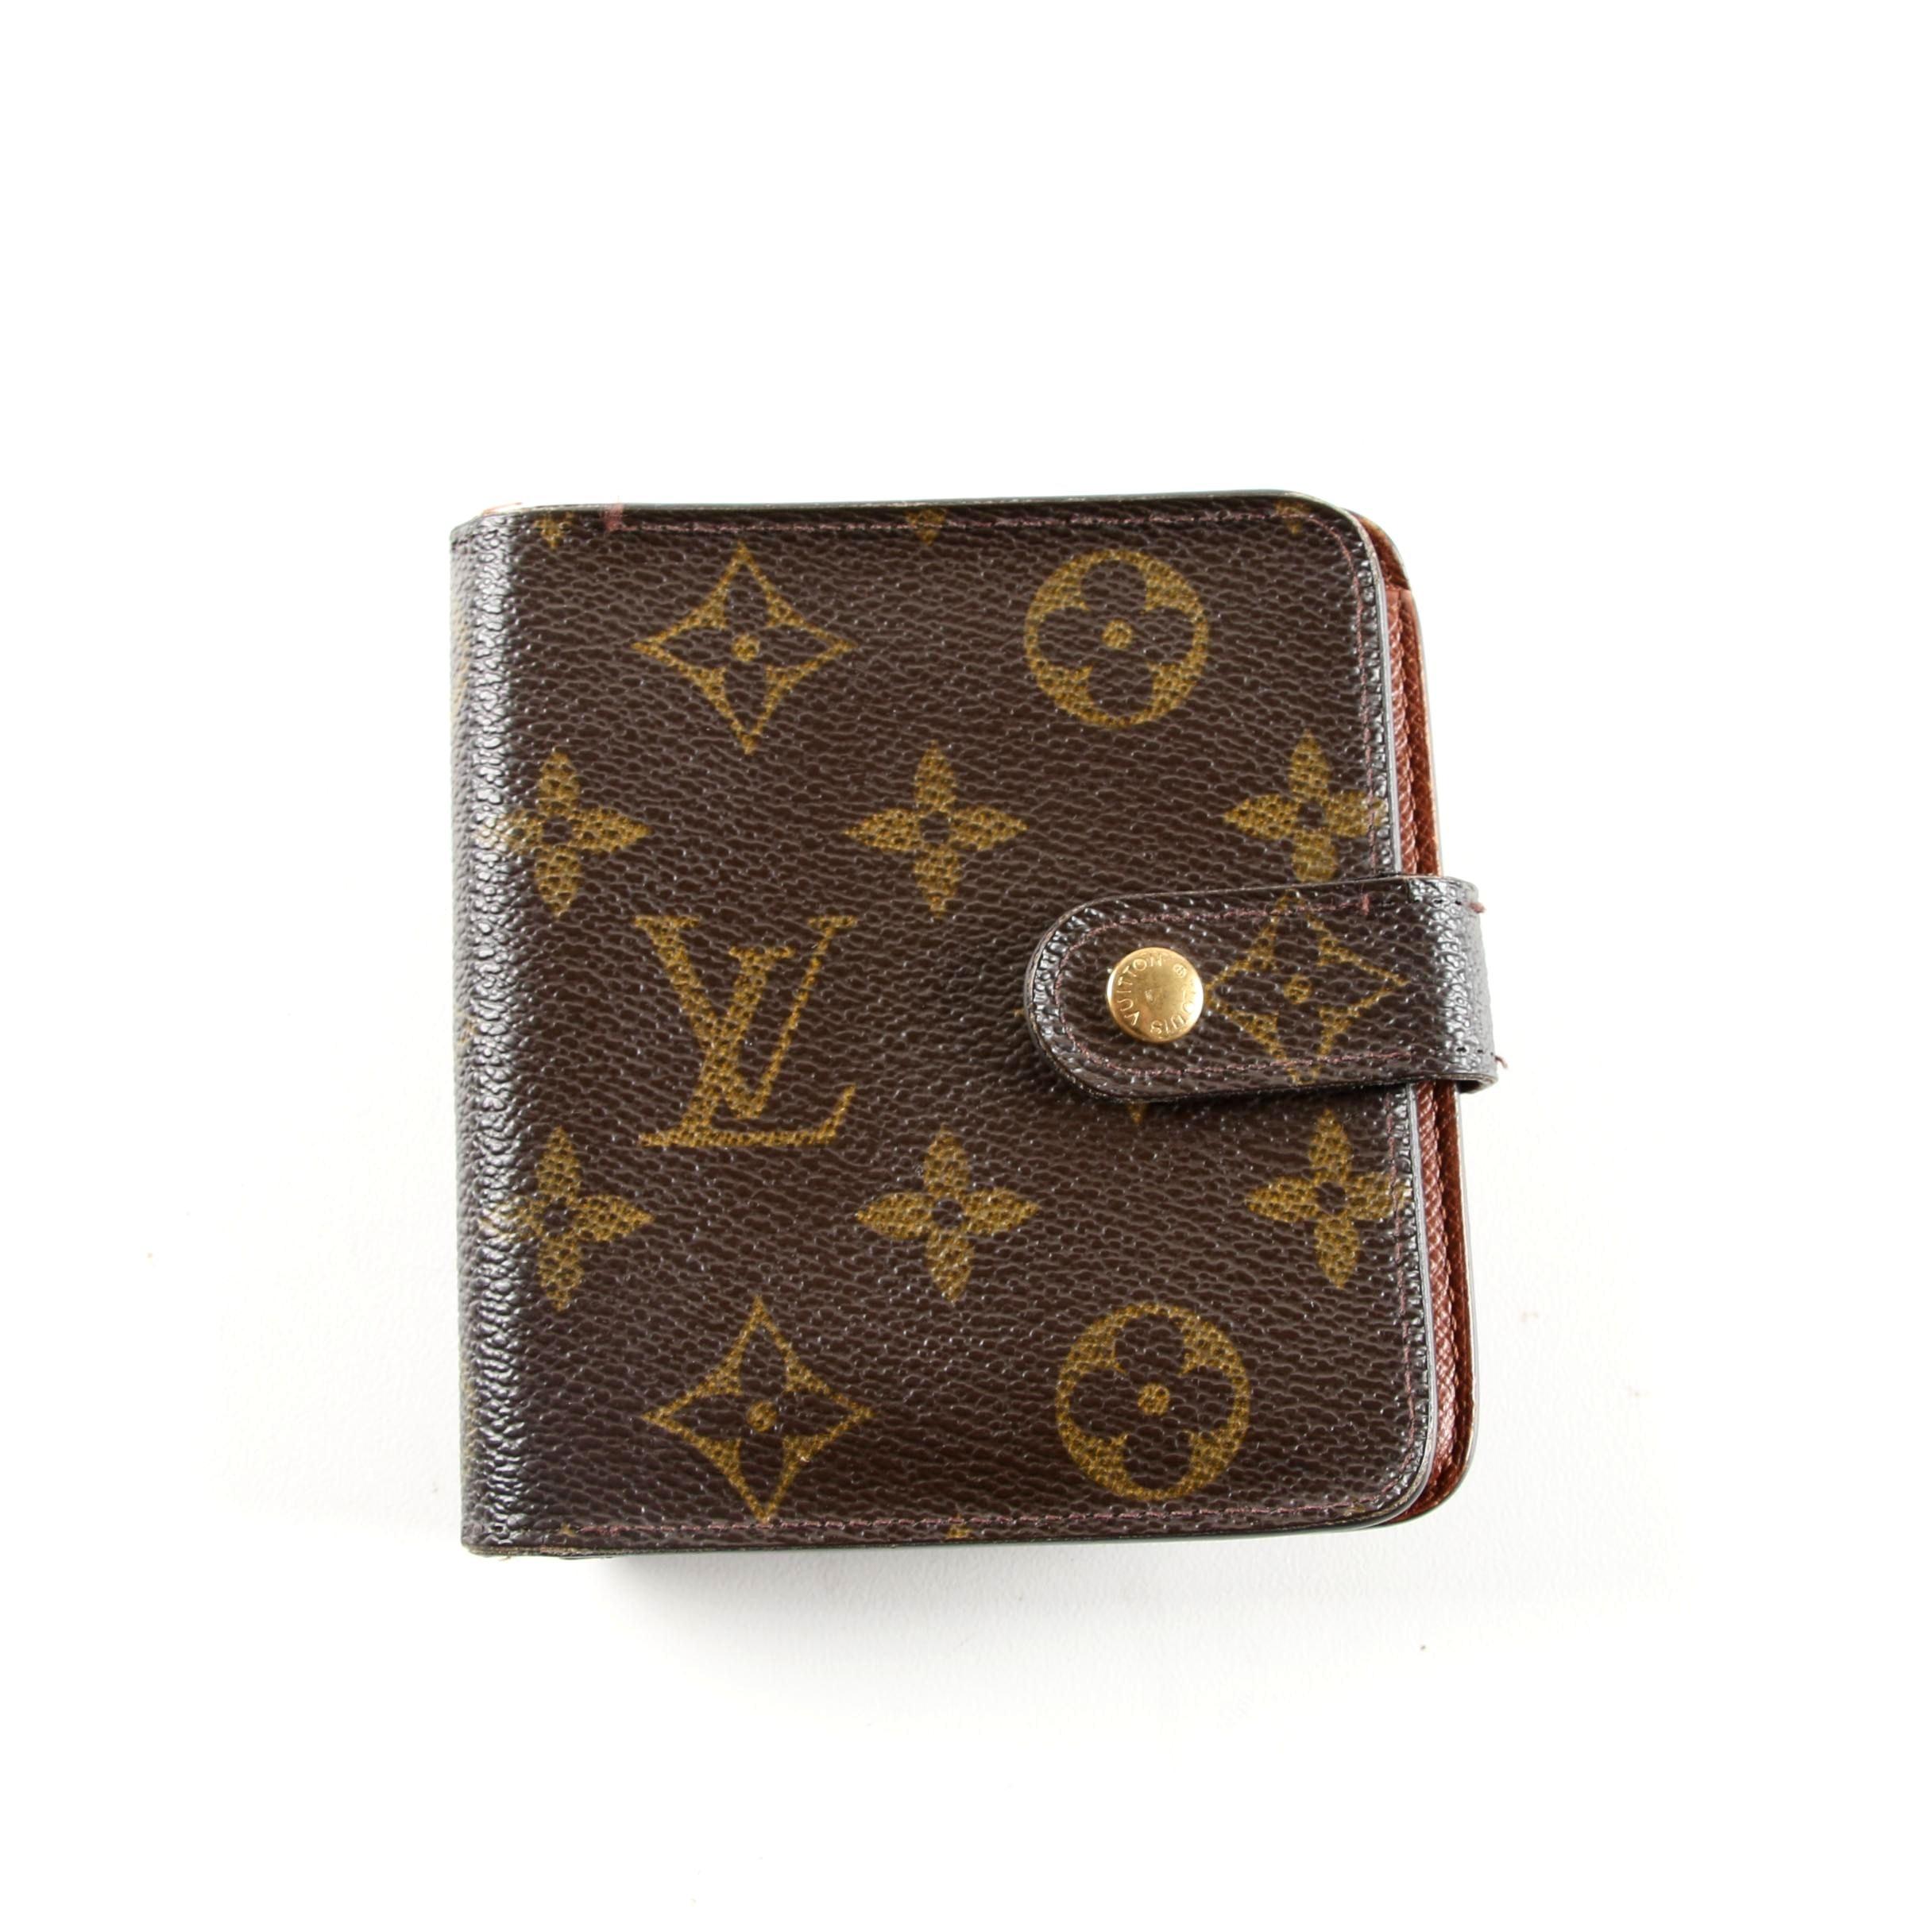 Louis Vuitton of Paris Monogram Zip Bifold Wallet